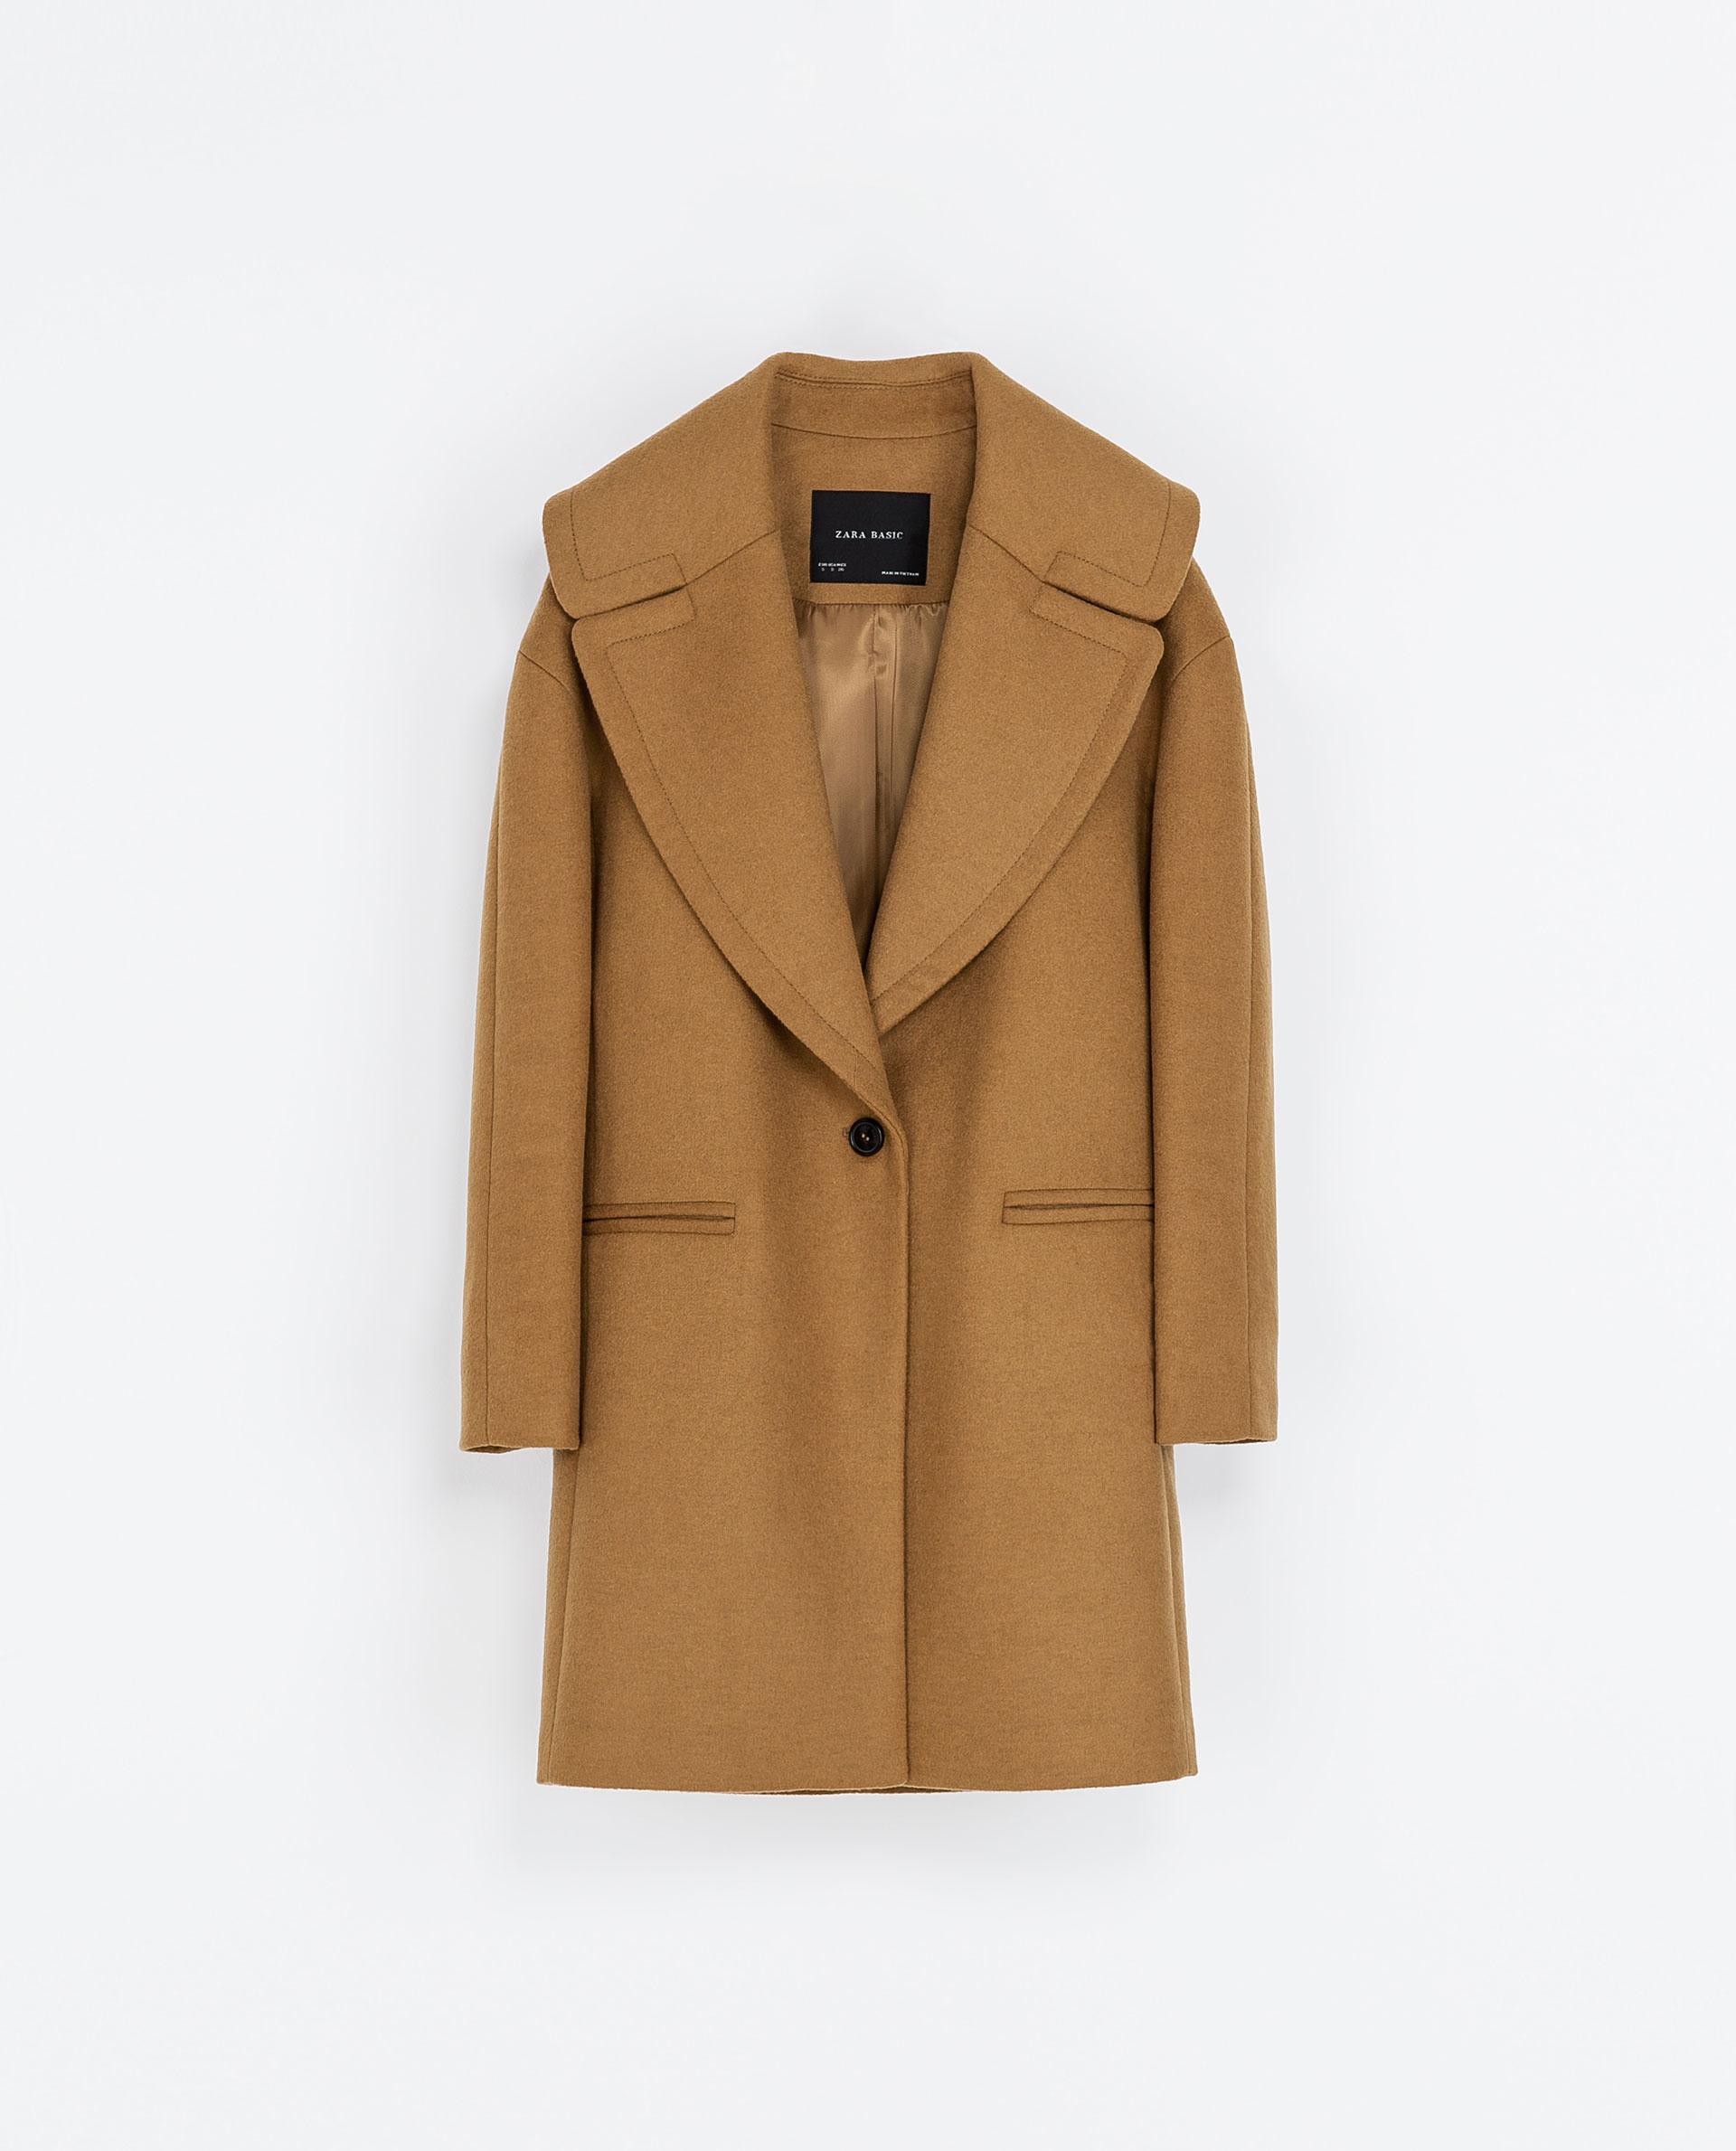 Zara Coat with Large Lapel in Beige (Camel)